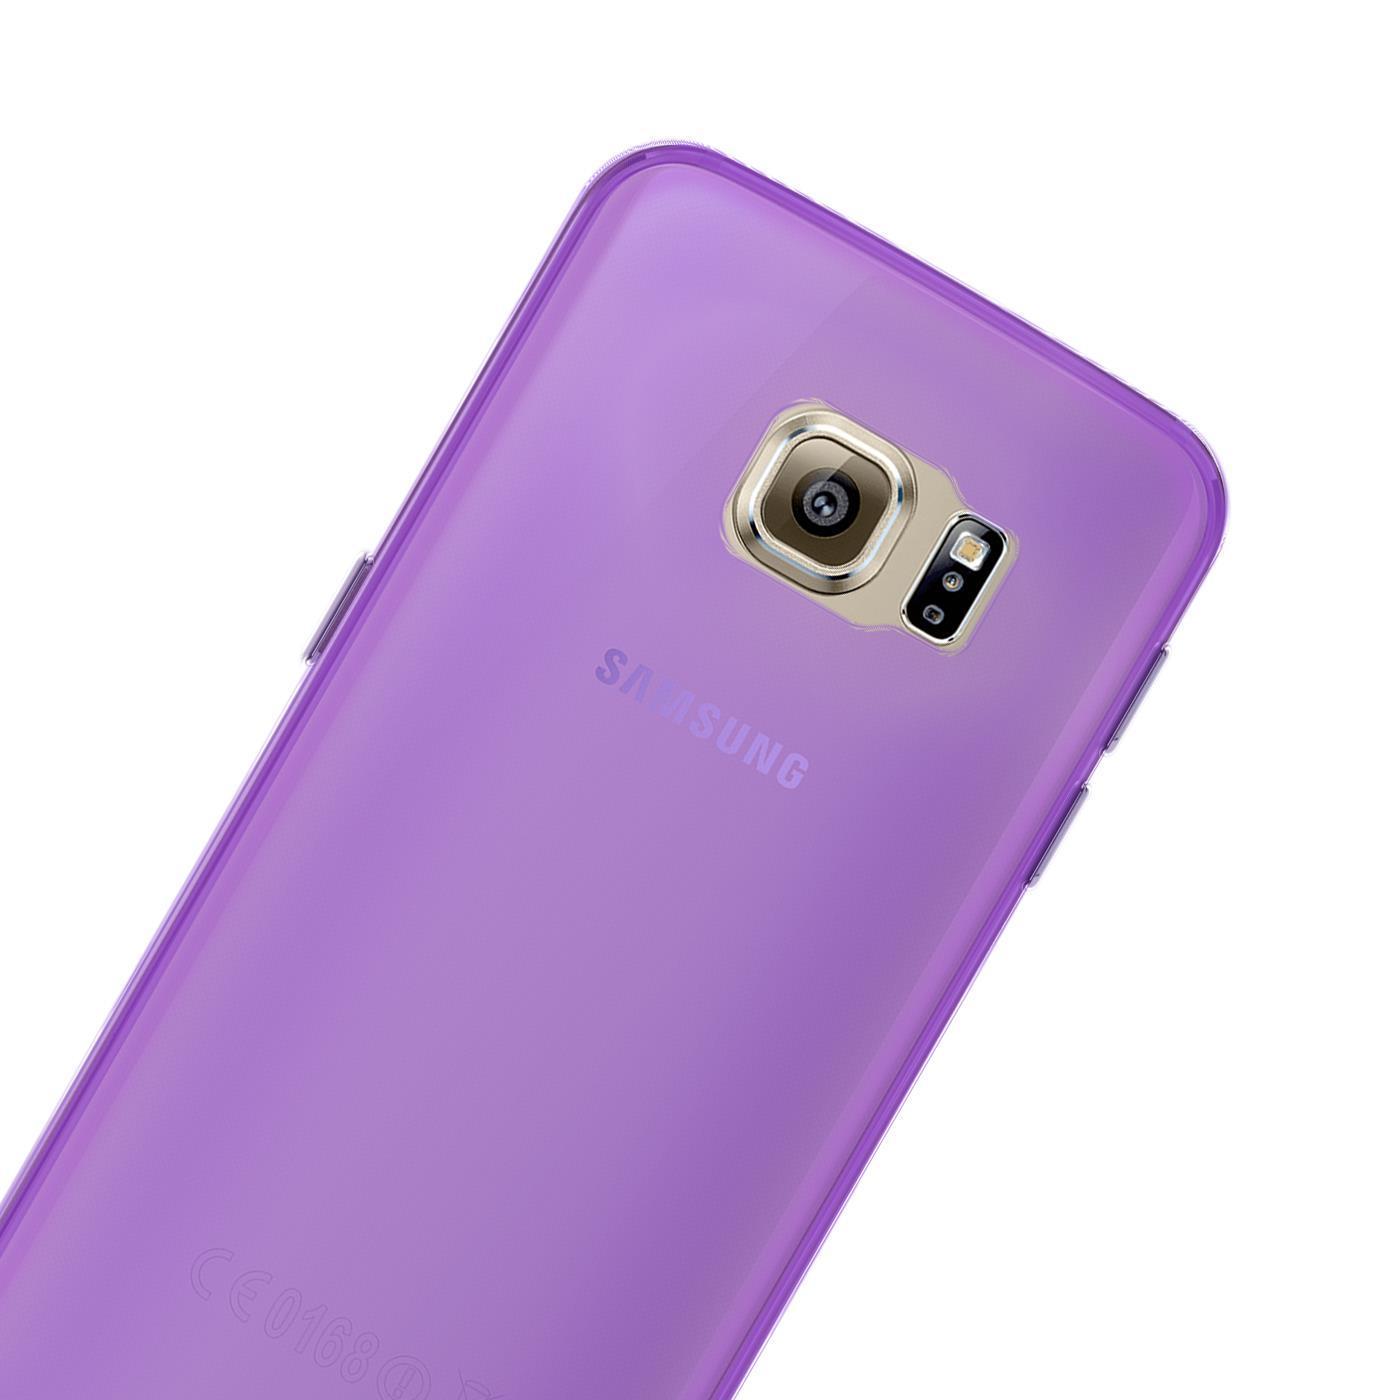 Ultra-Slim-Cover-fuer-Samsung-Galaxy-Huelle-Case-Silikon-Schutzhuelle-Bumper-Tasche